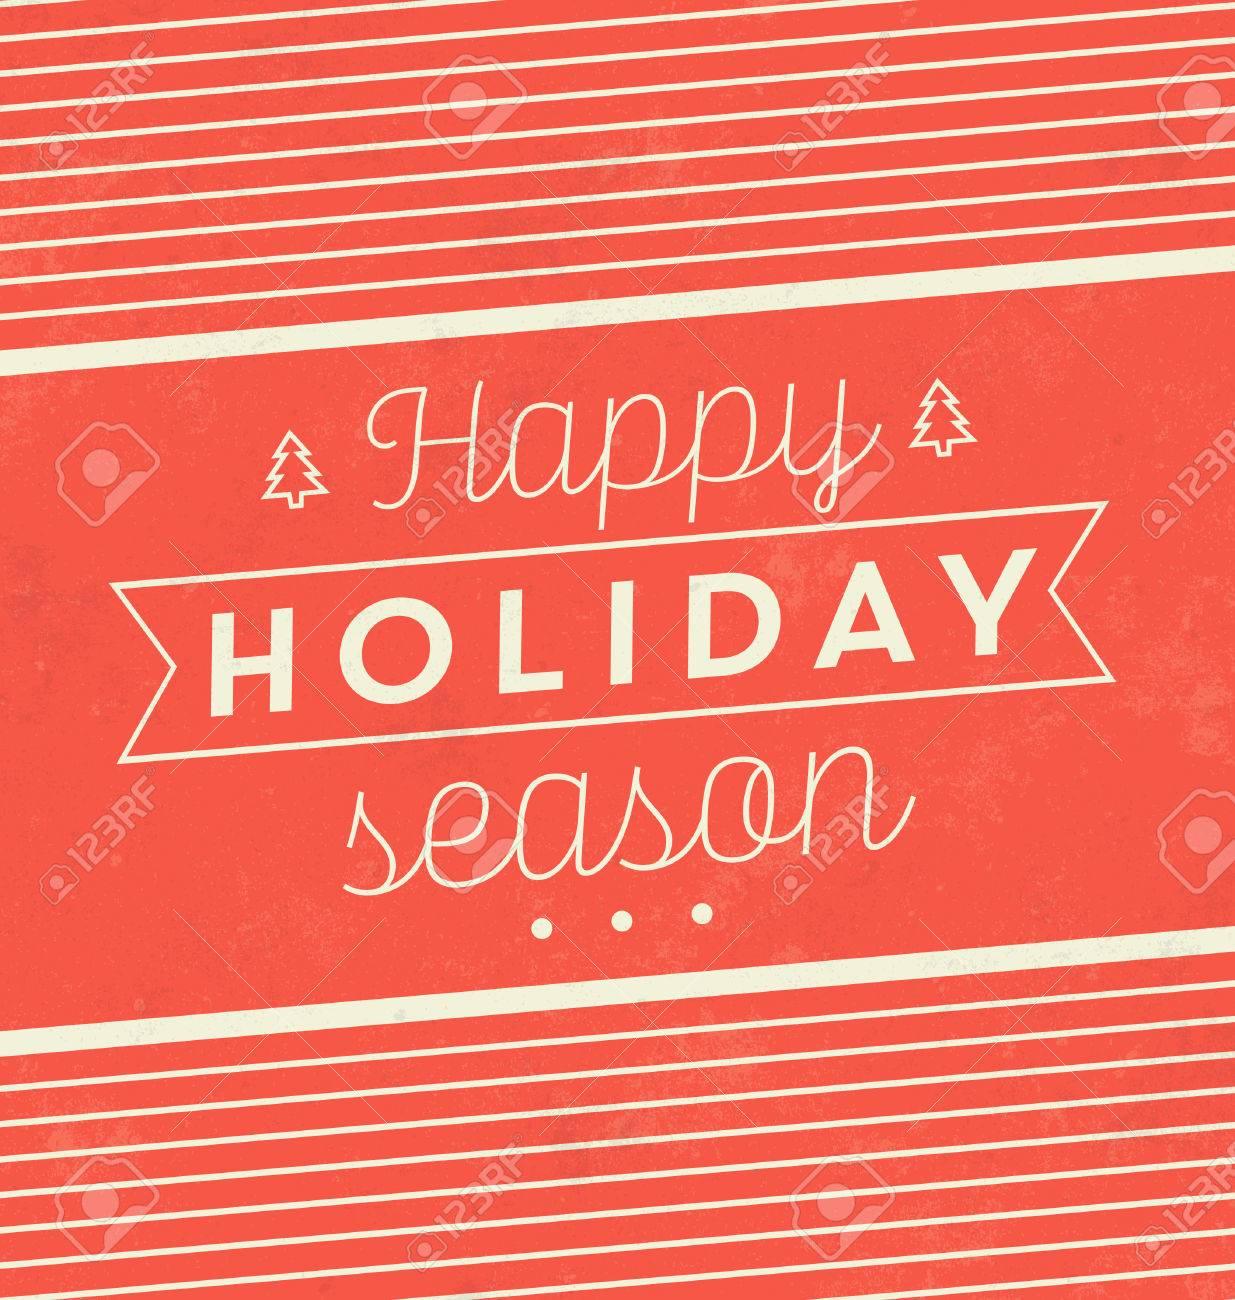 Vintage Christmas Typographic Background / Retro Design / Happy Holiday Season - 53347808